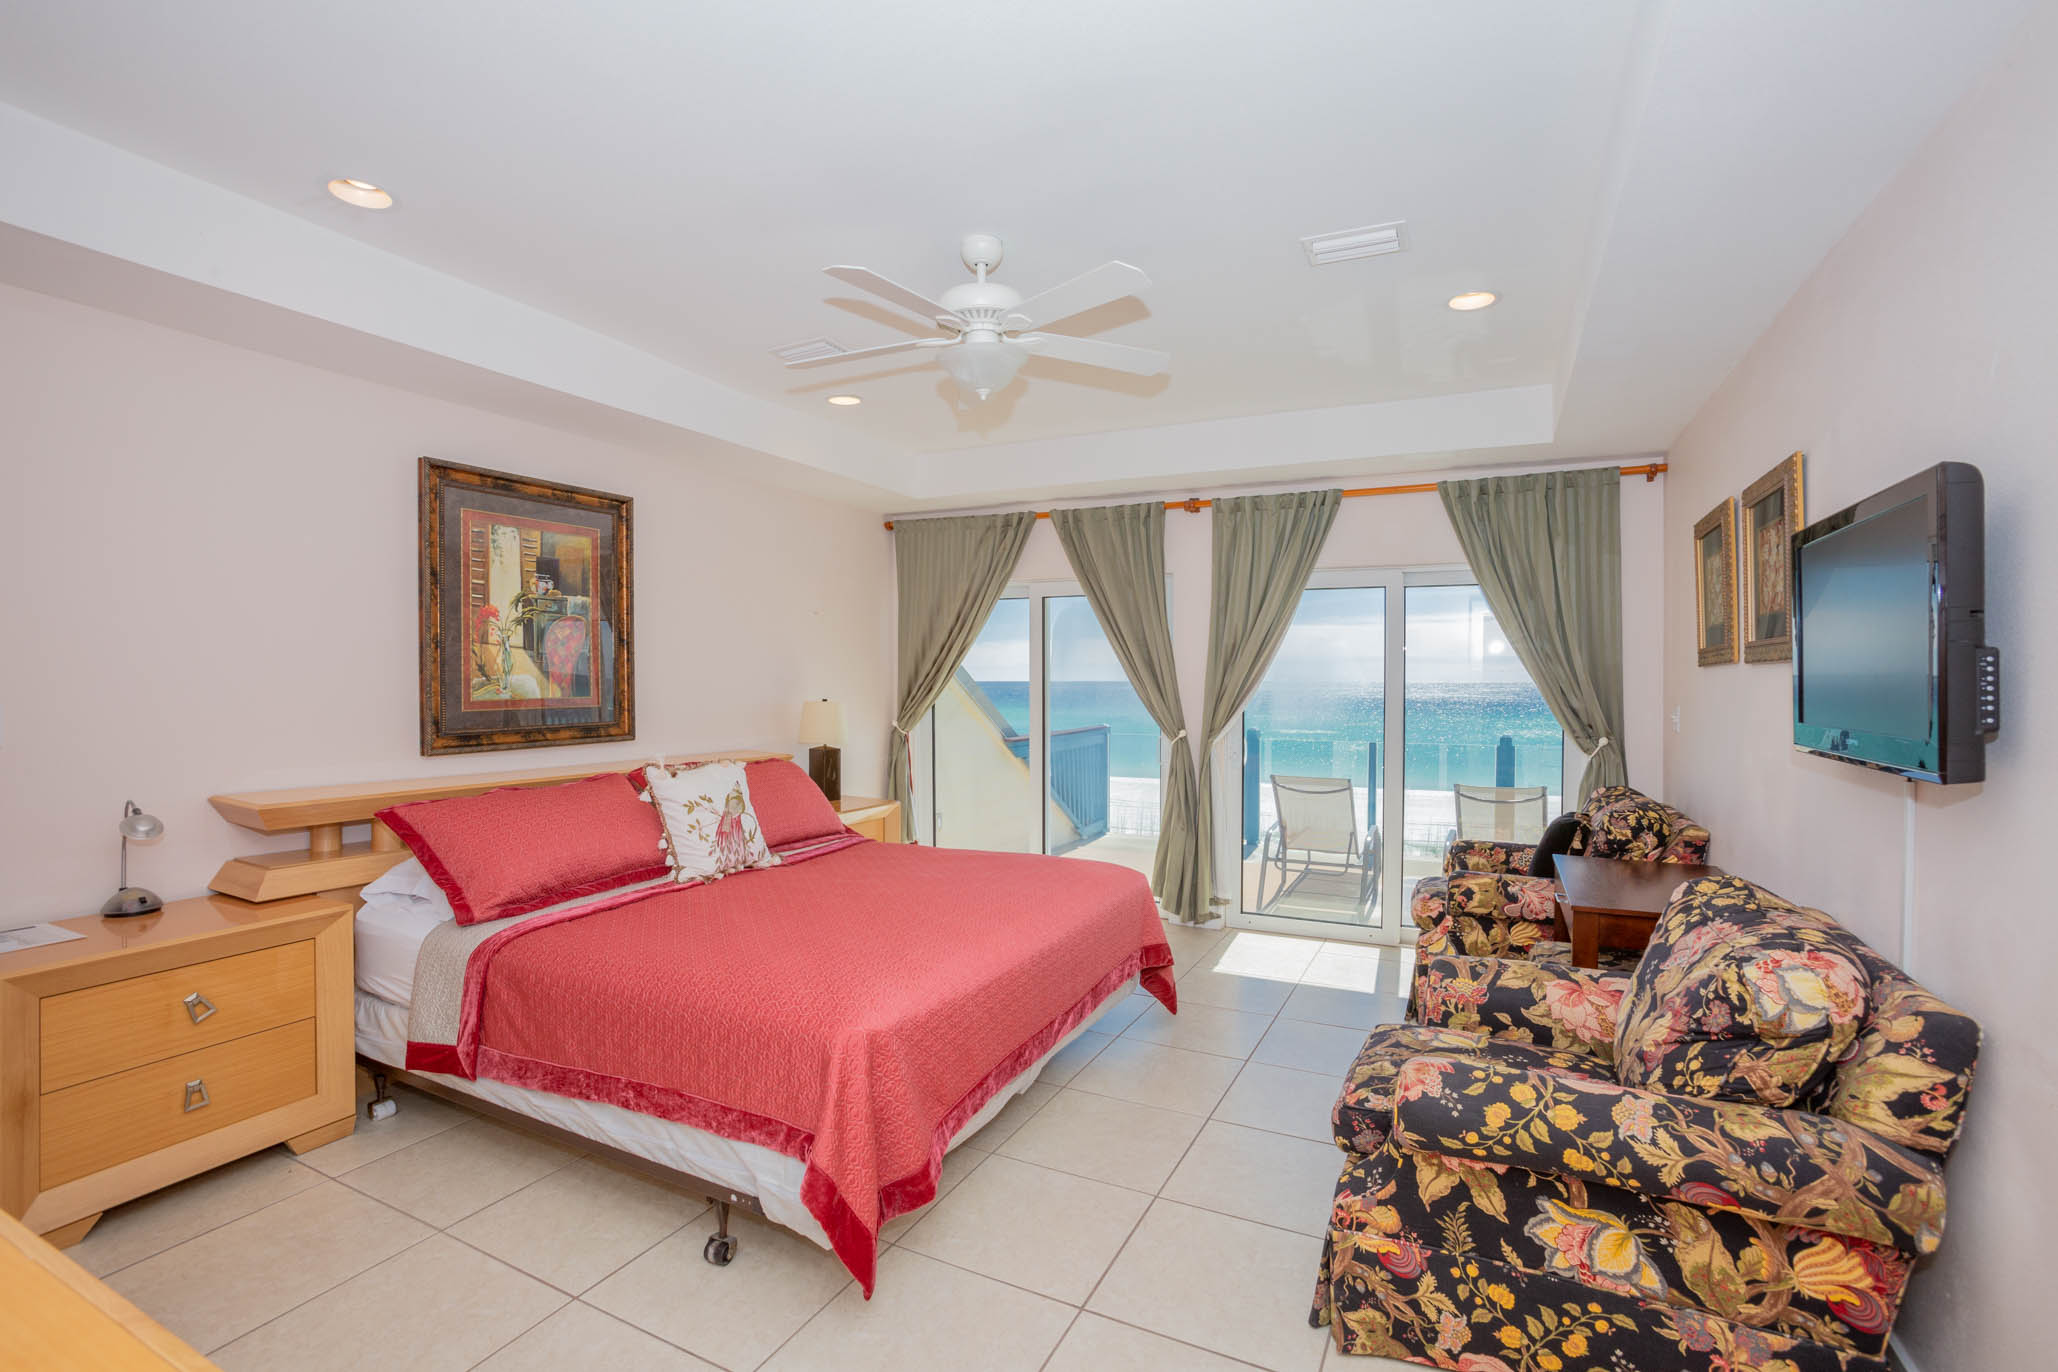 Ariola 1214 House/Cottage rental in Luxury Homes in Pensacola Beach Florida - #43